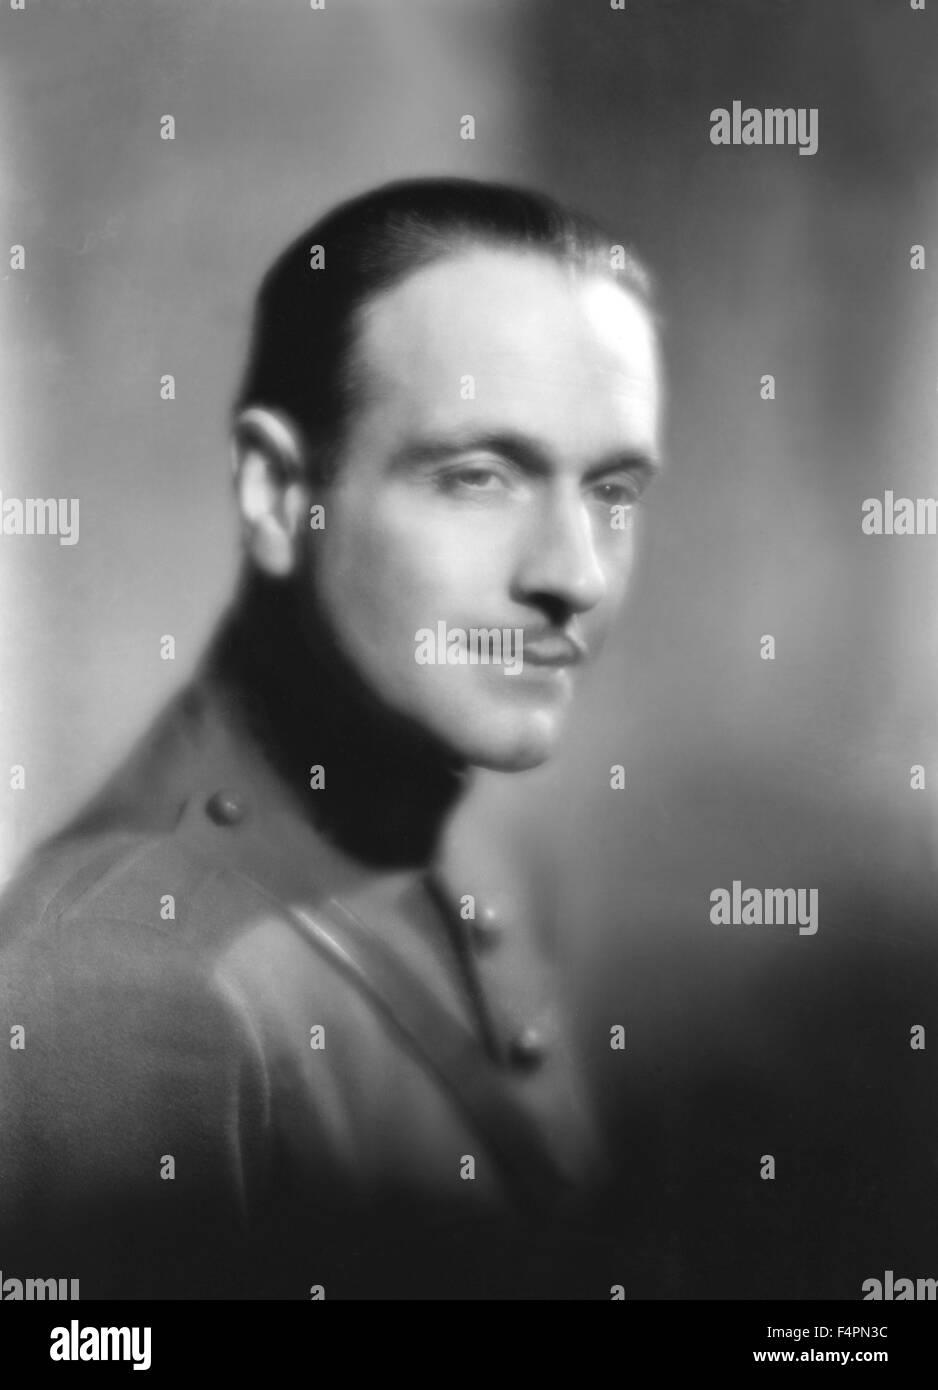 Pierre Fresnay / La grande illusion / 1937 directed by Jean Renoir - Stock Image